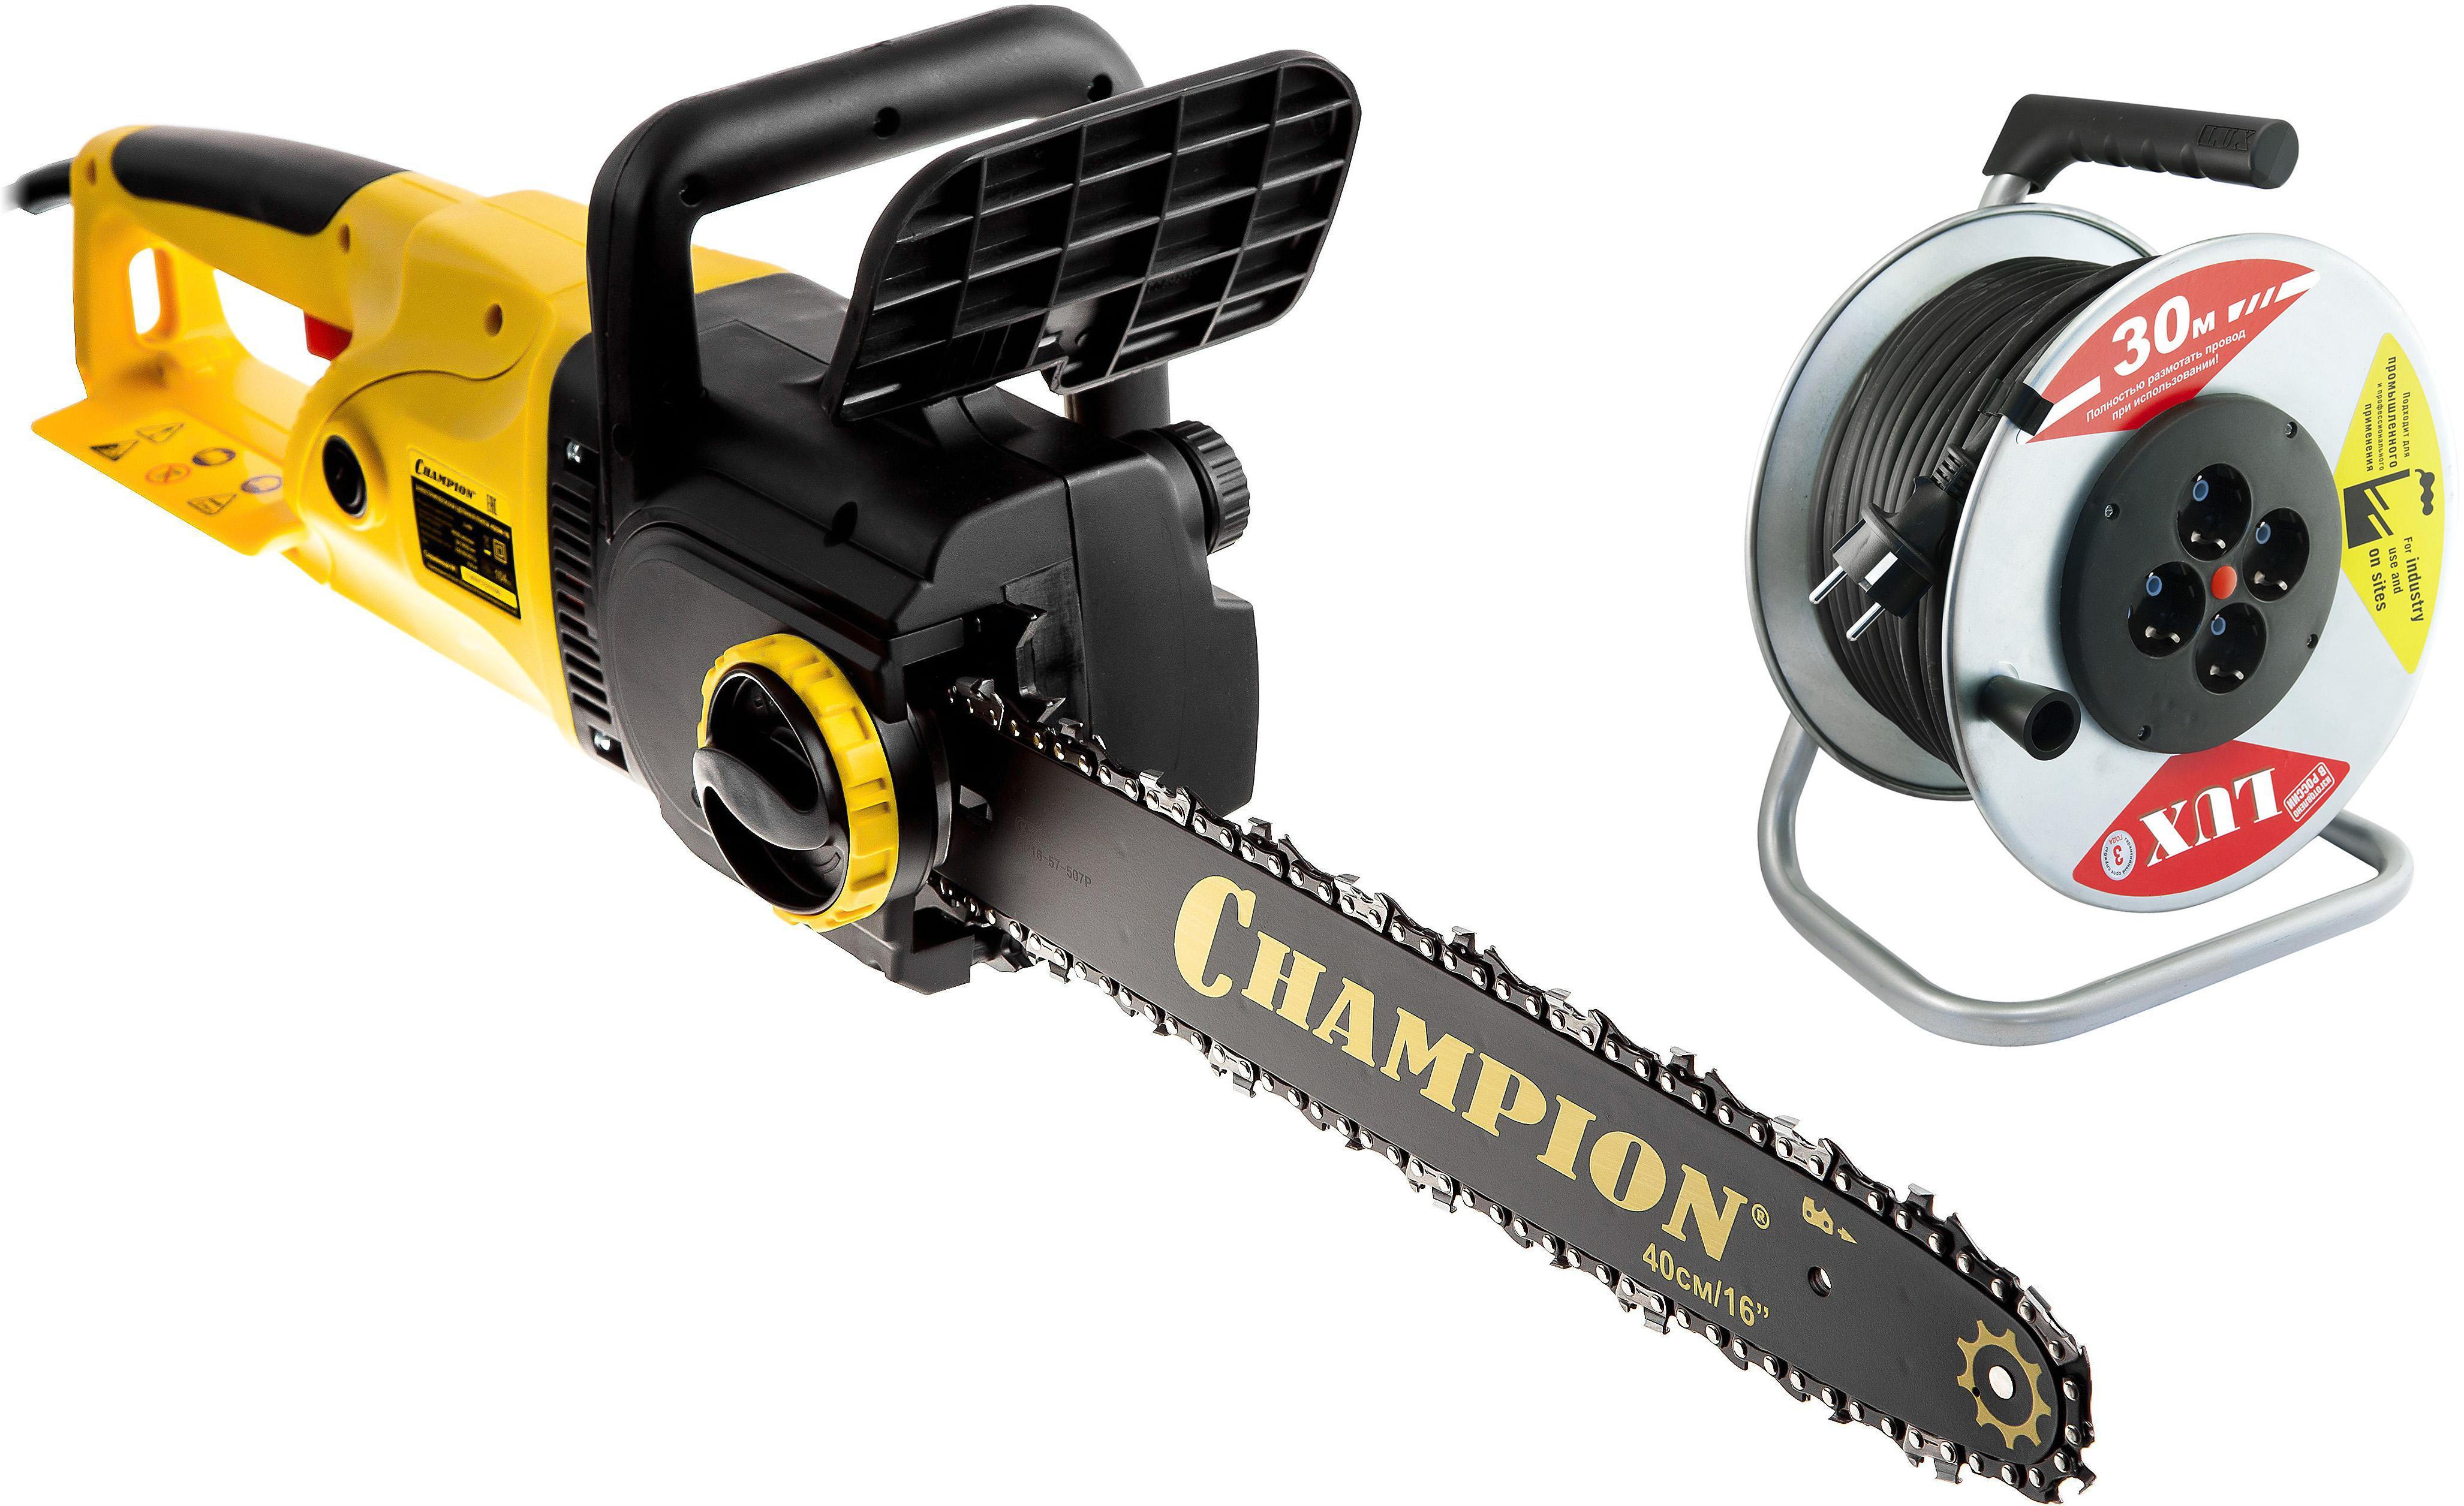 цена на Набор Champion Пила цепная 420n-16 +Удлинитель 45130